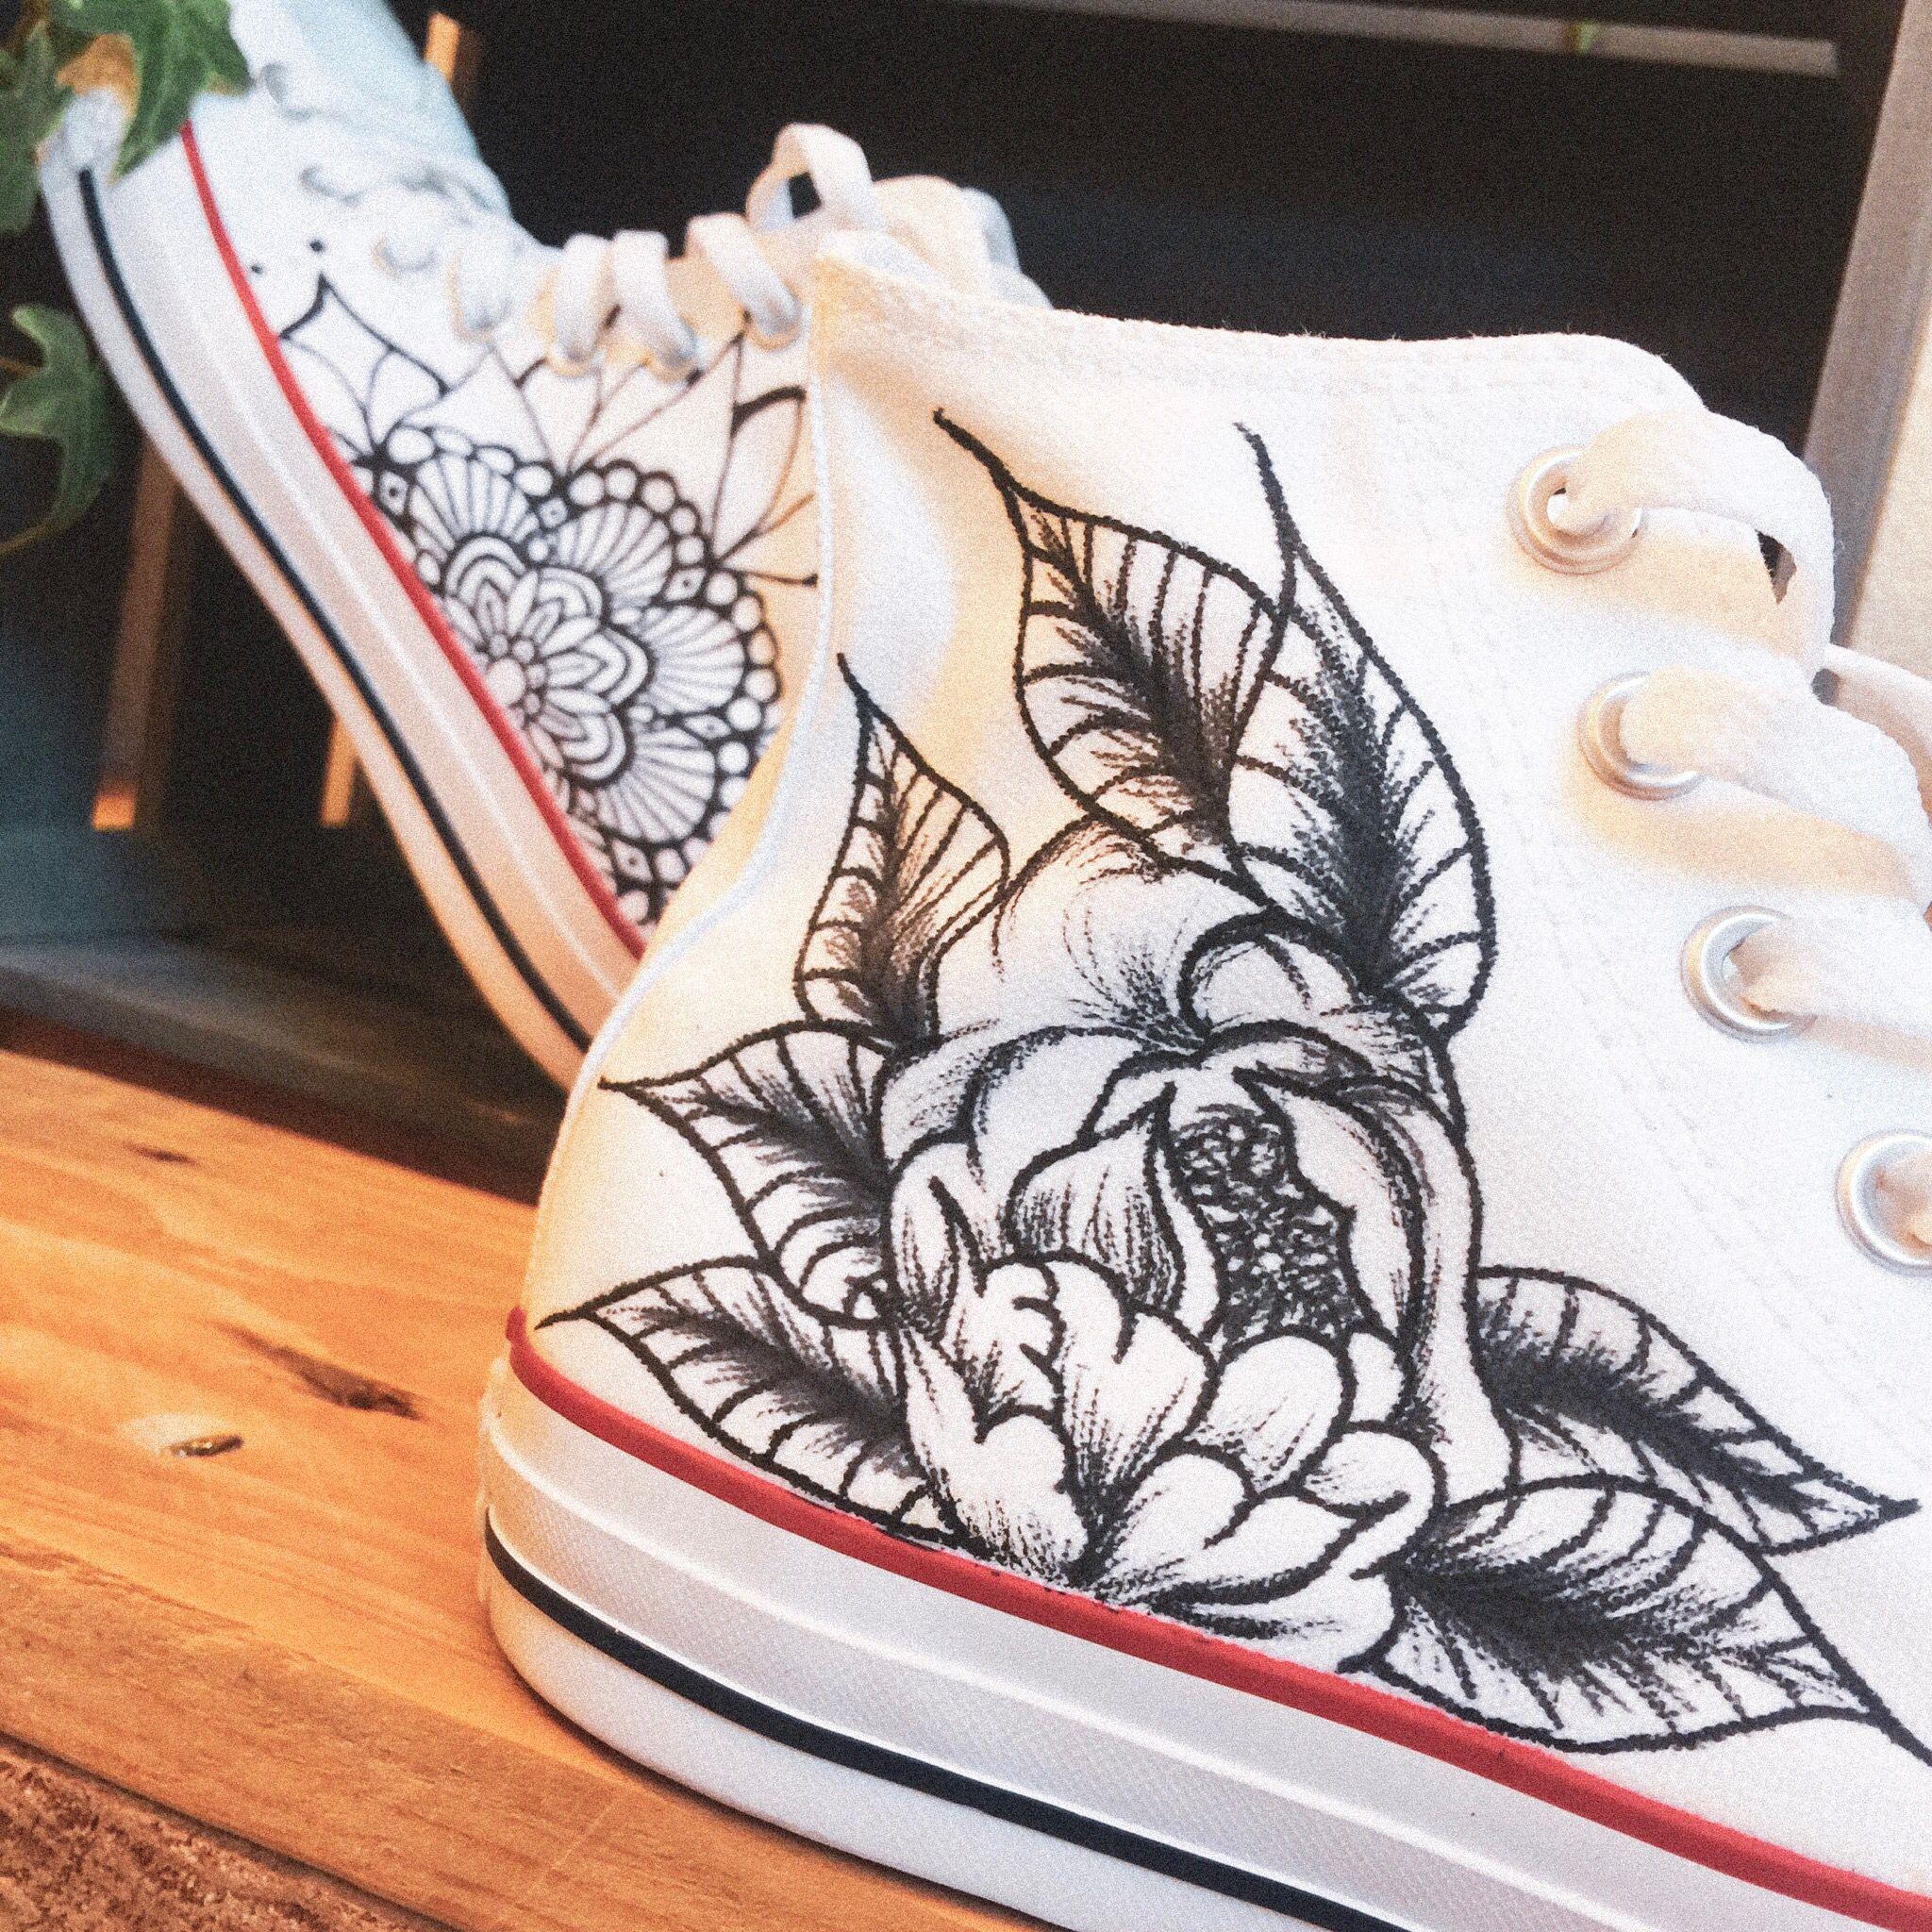 Tattoo Chucks Shoes Diy Chucks Shoes Chucks Wedding Shoes Diy Wedding Shoes